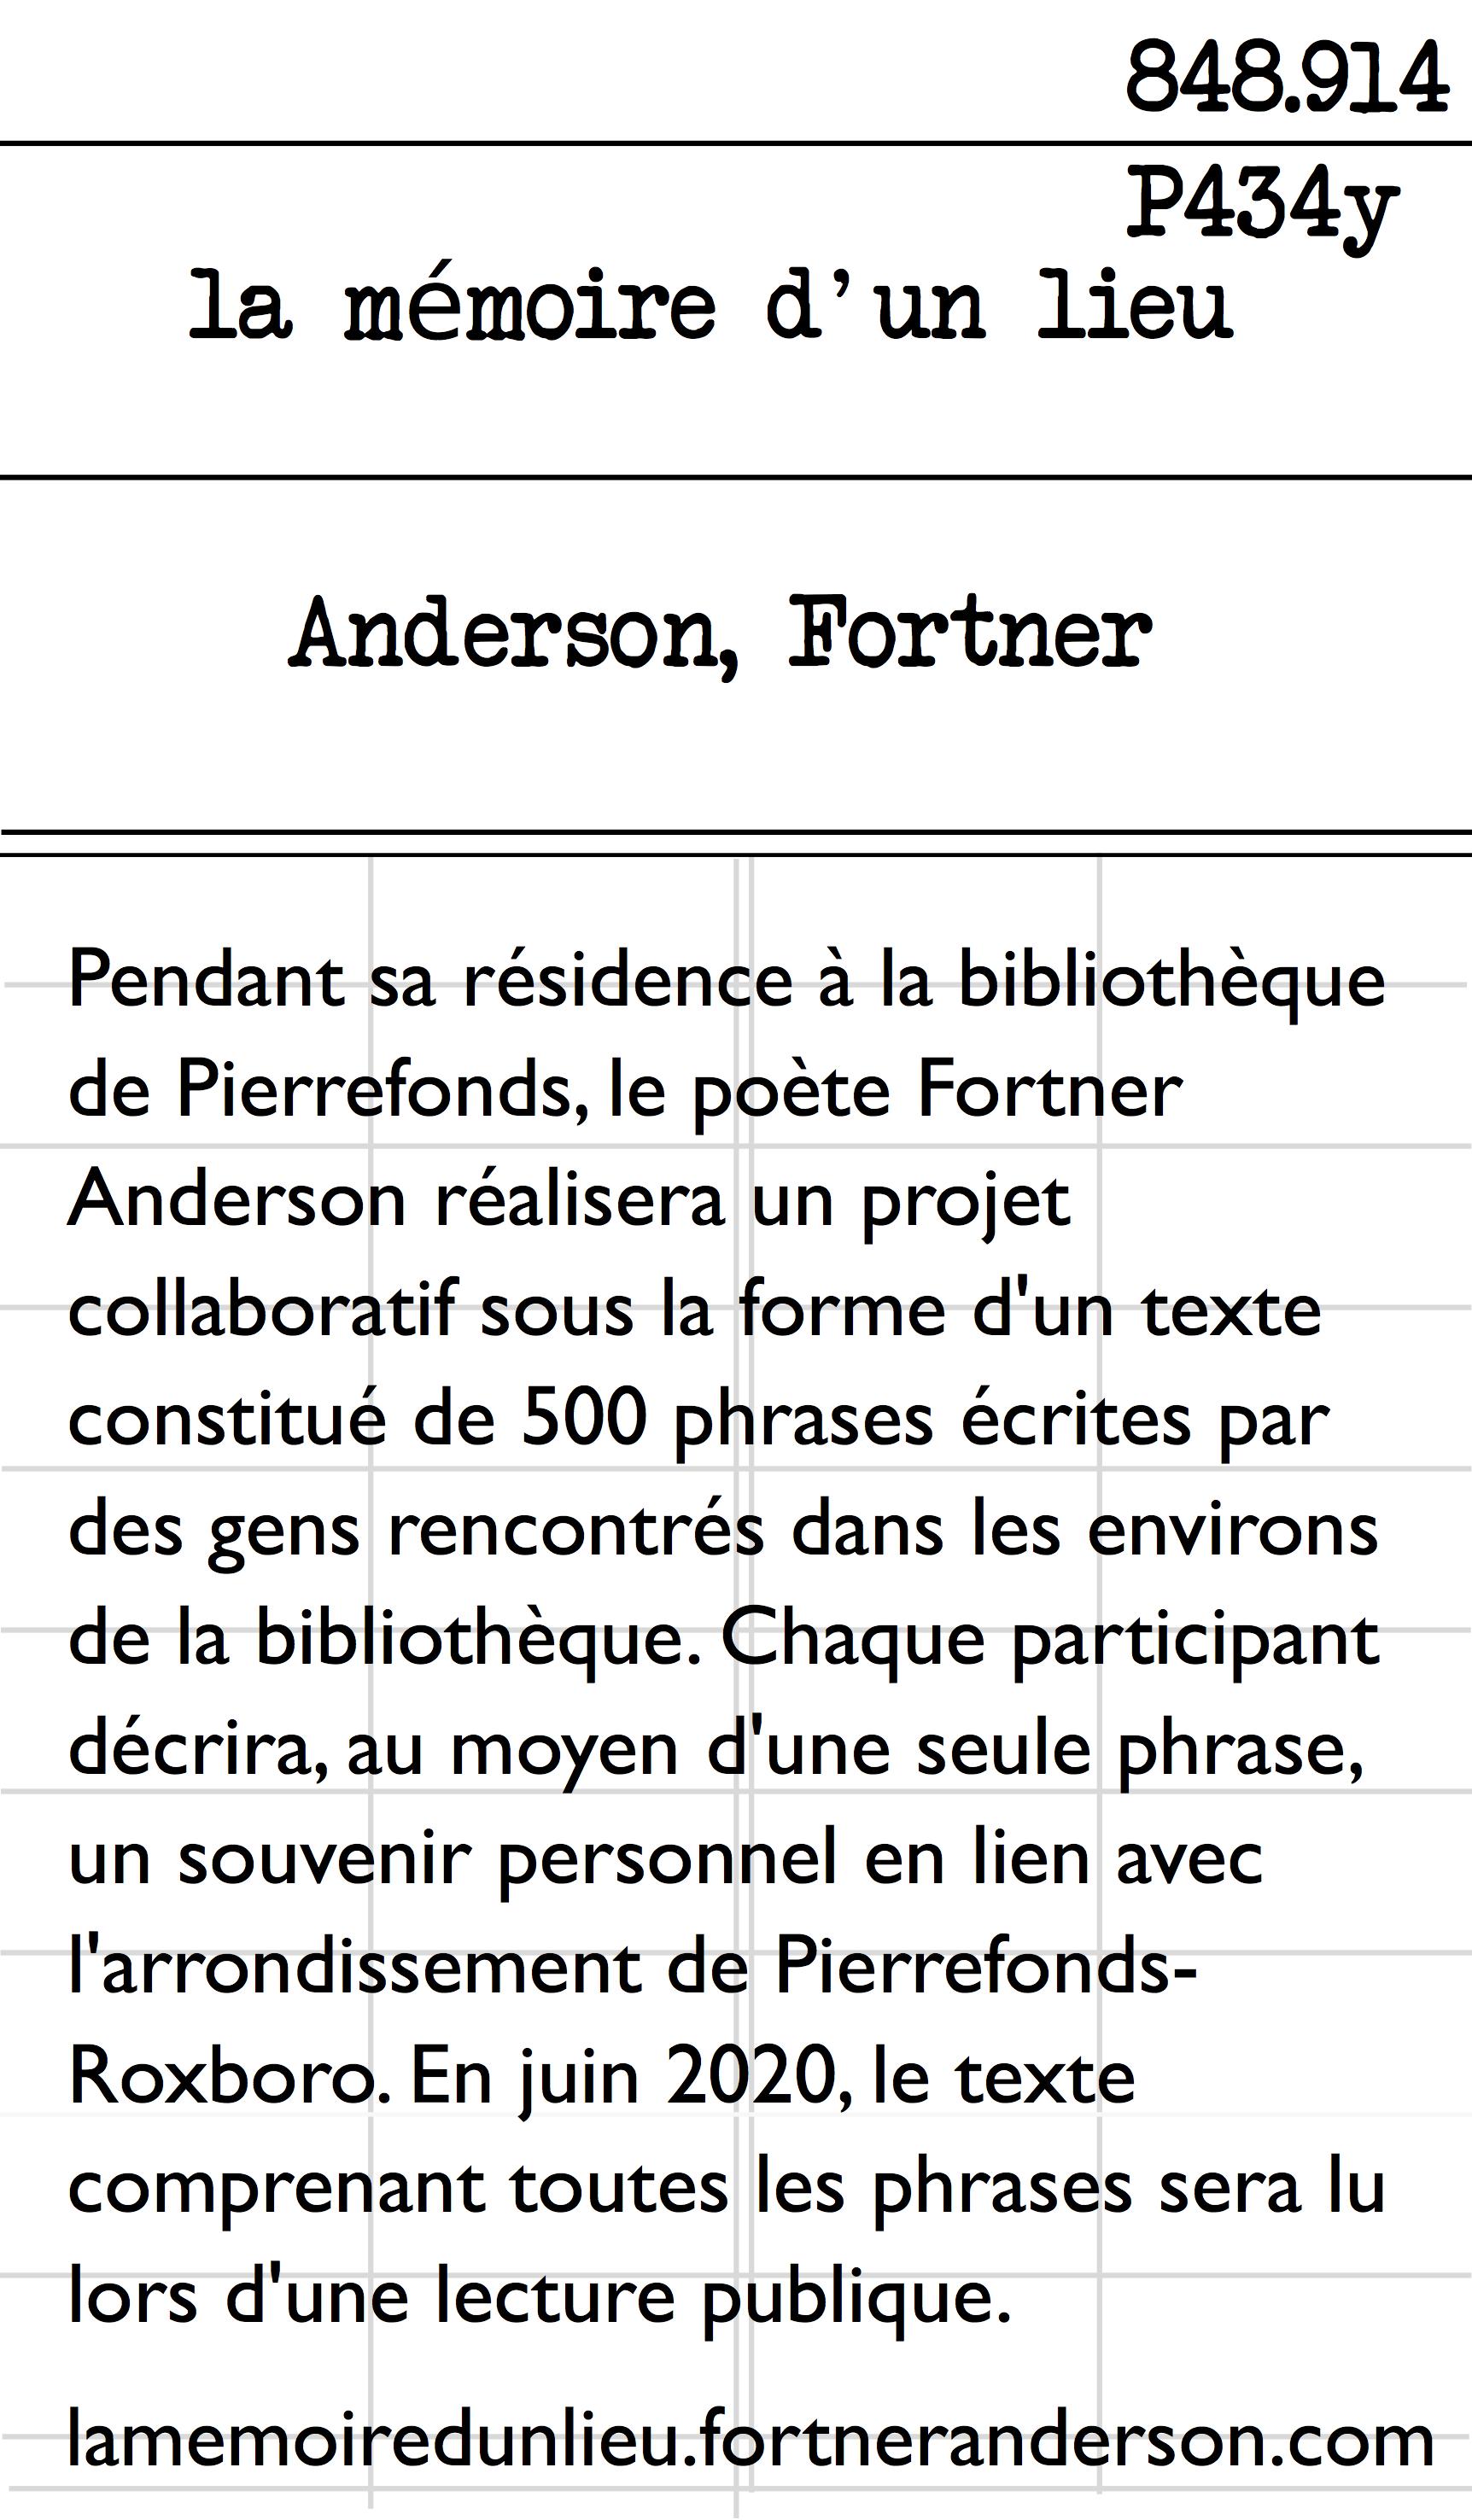 Library card_ver_6_fr